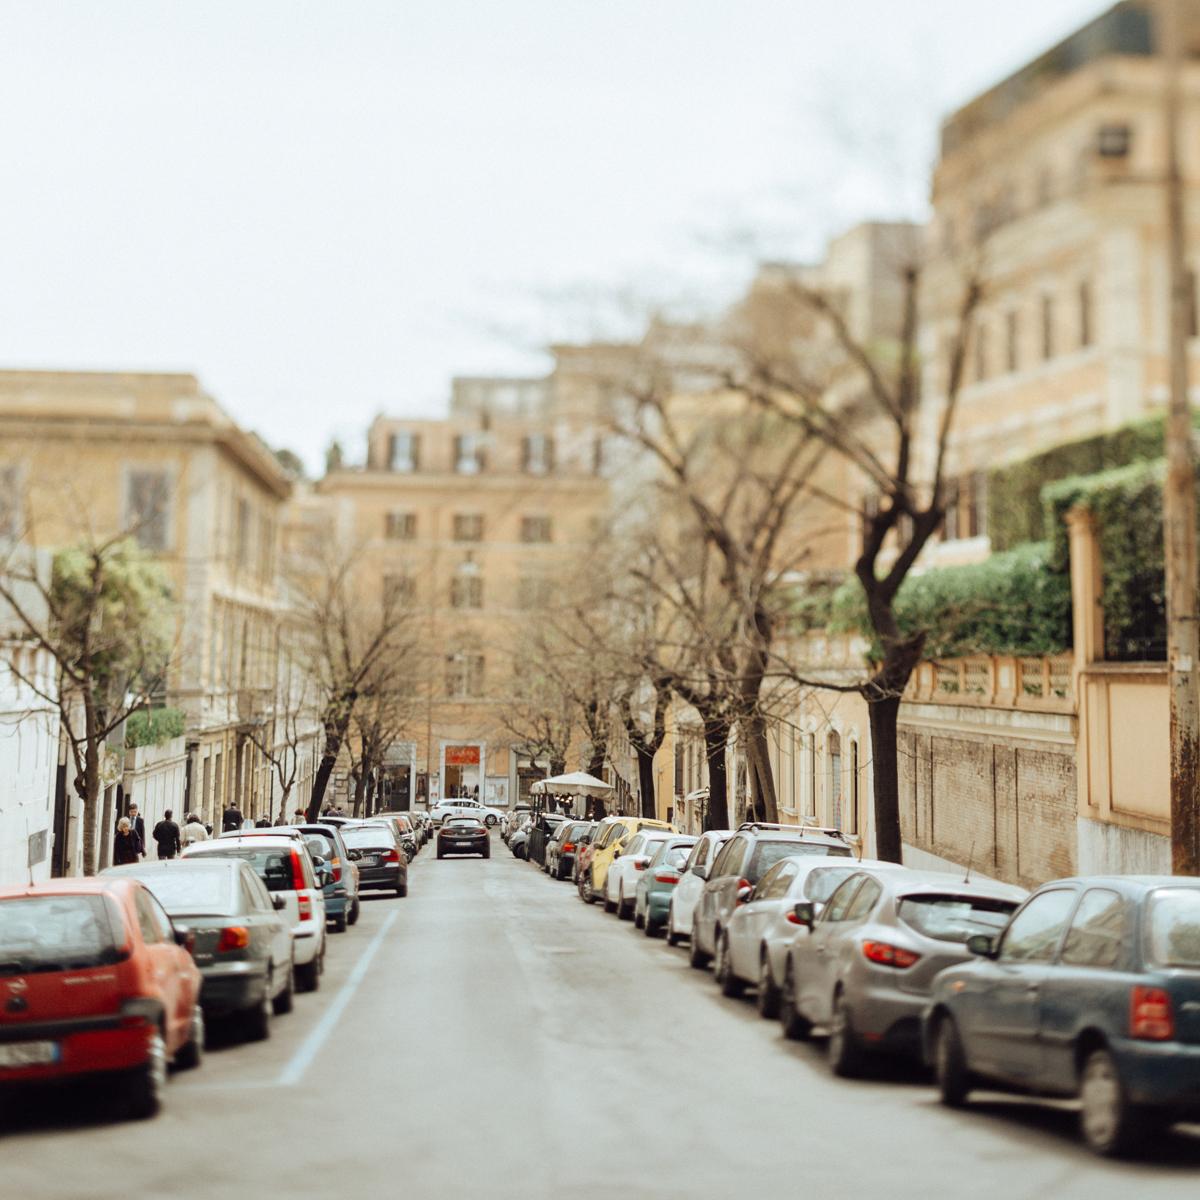 383-Petersone-Liene-Rome-blog